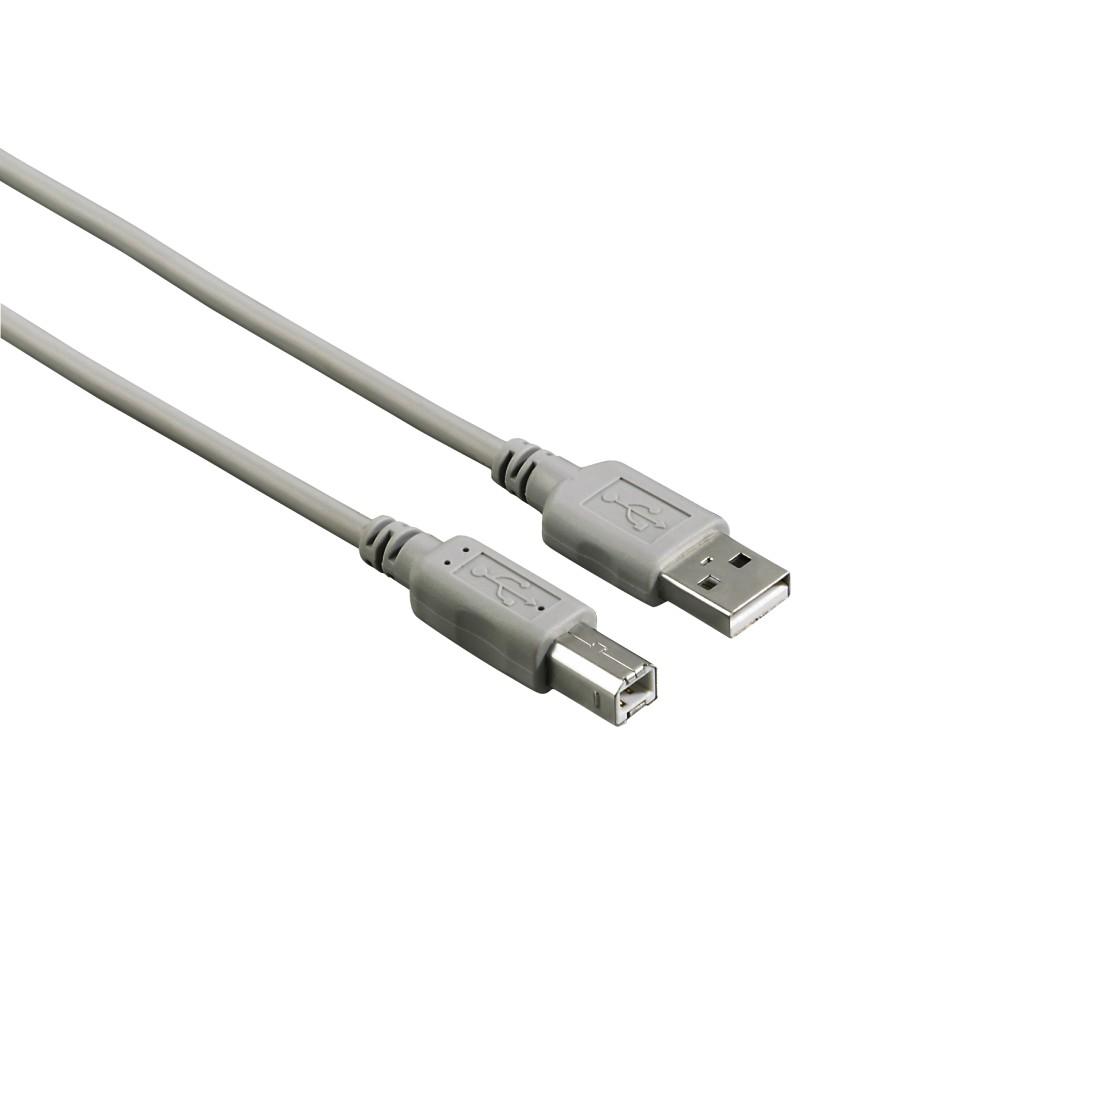 Cablu imprimanta USB 2.0 Tip A-B, 1.8 m